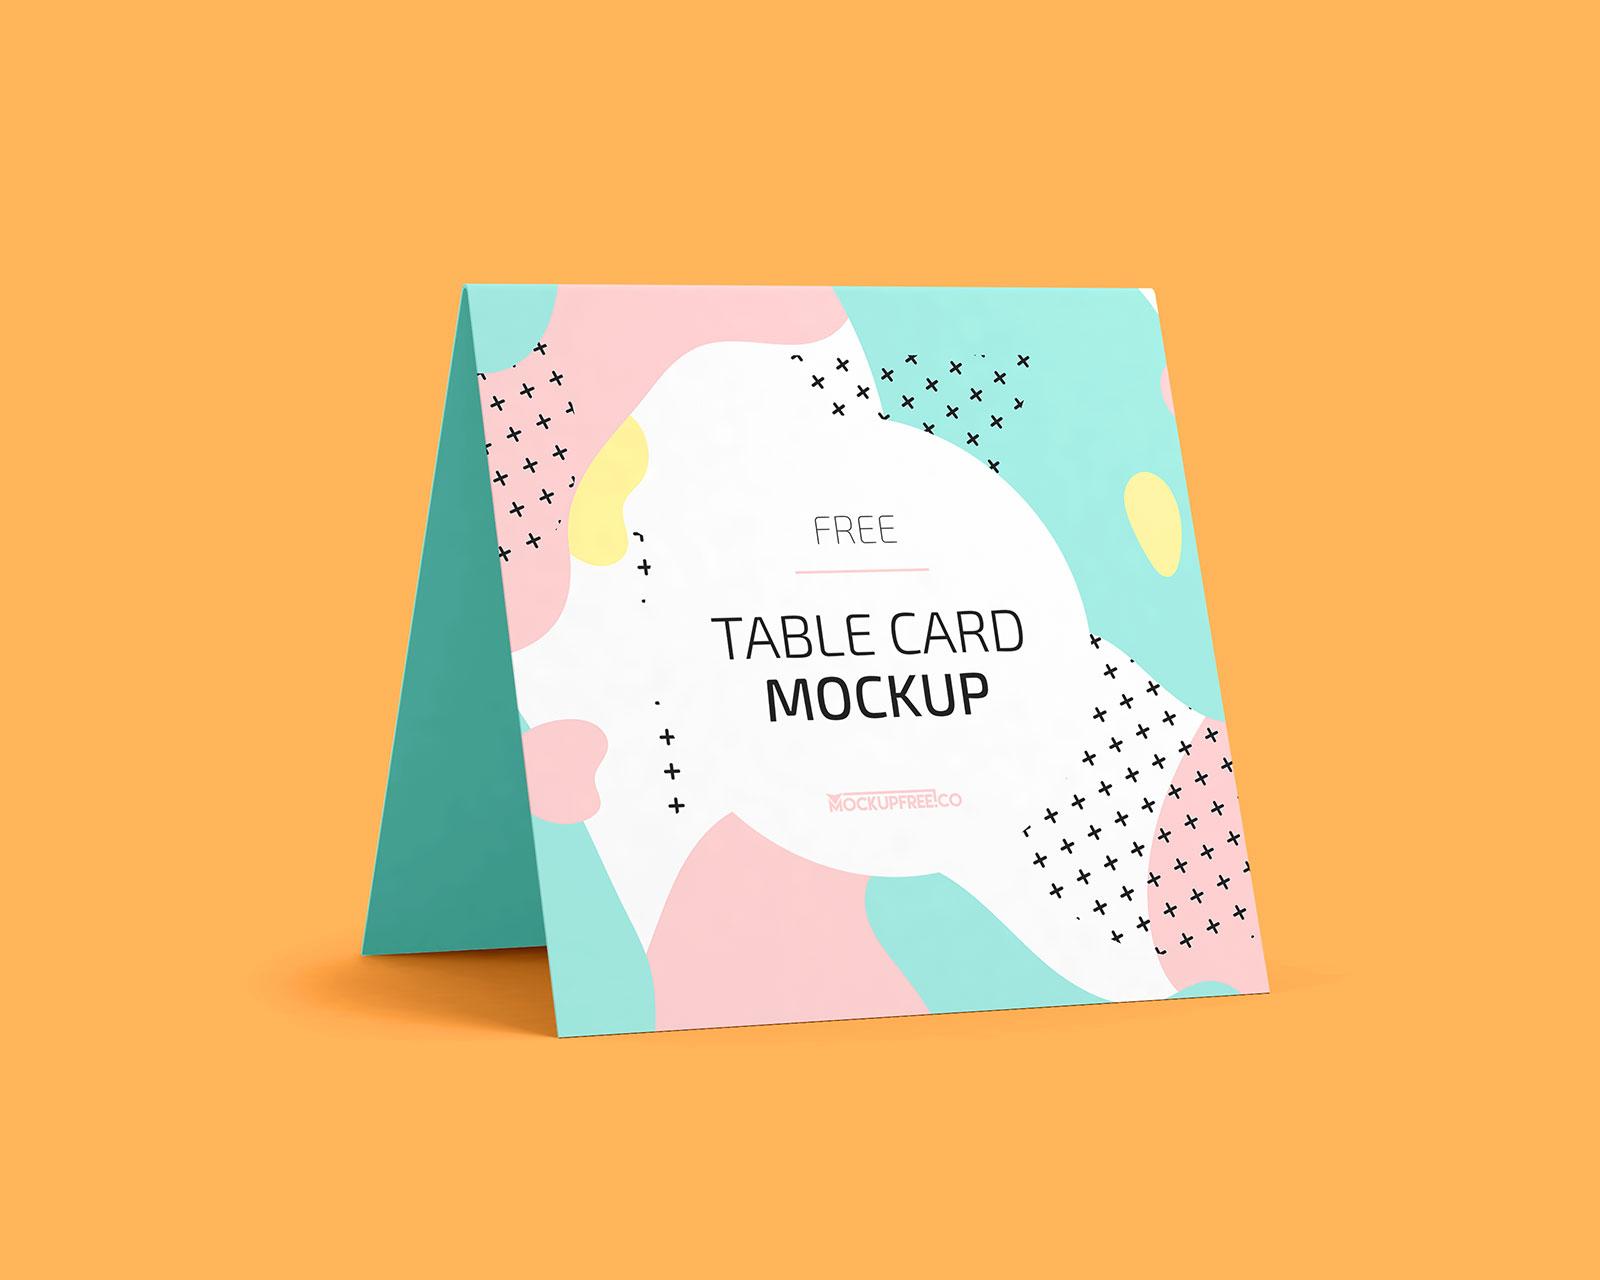 Free-Square-Greeting-Table-Card-Mockup-PSD-Set